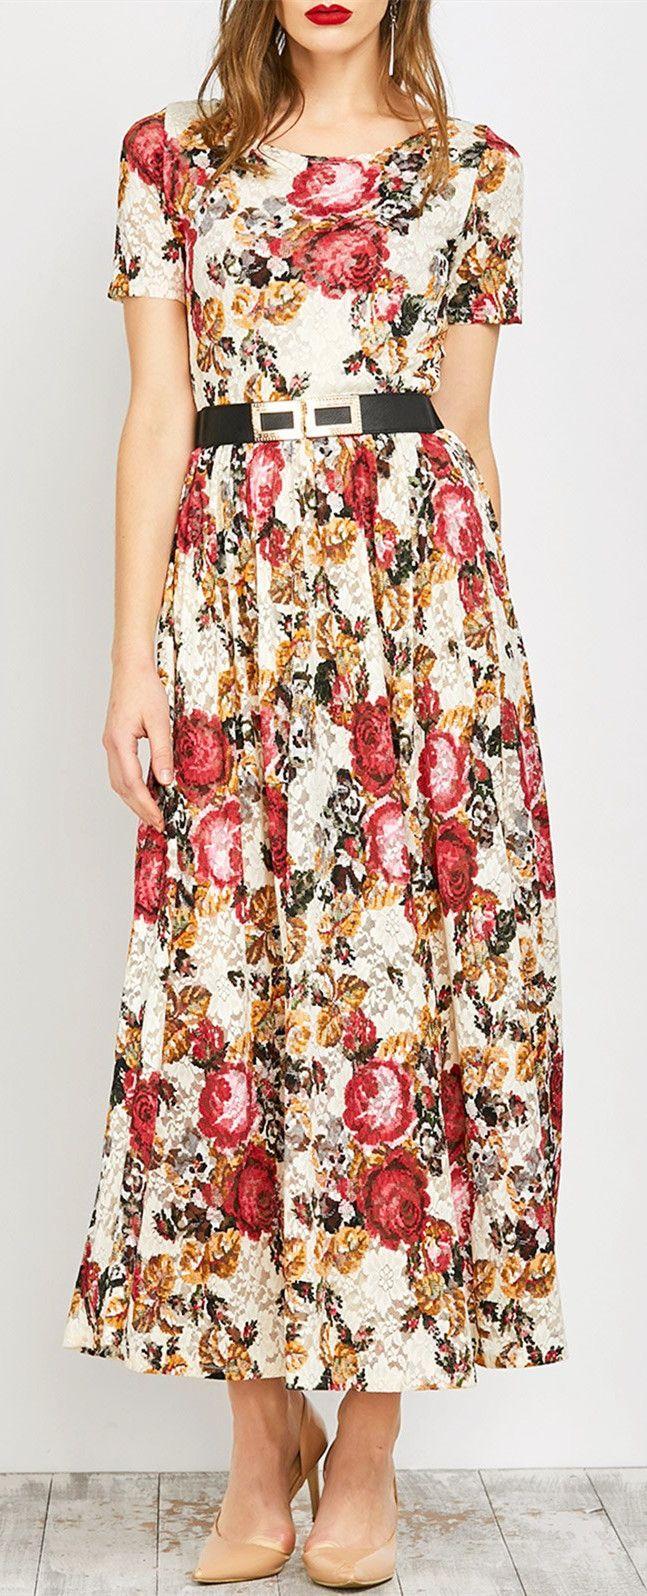 Bohemian lace floral print maxi dress floral print maxi dress